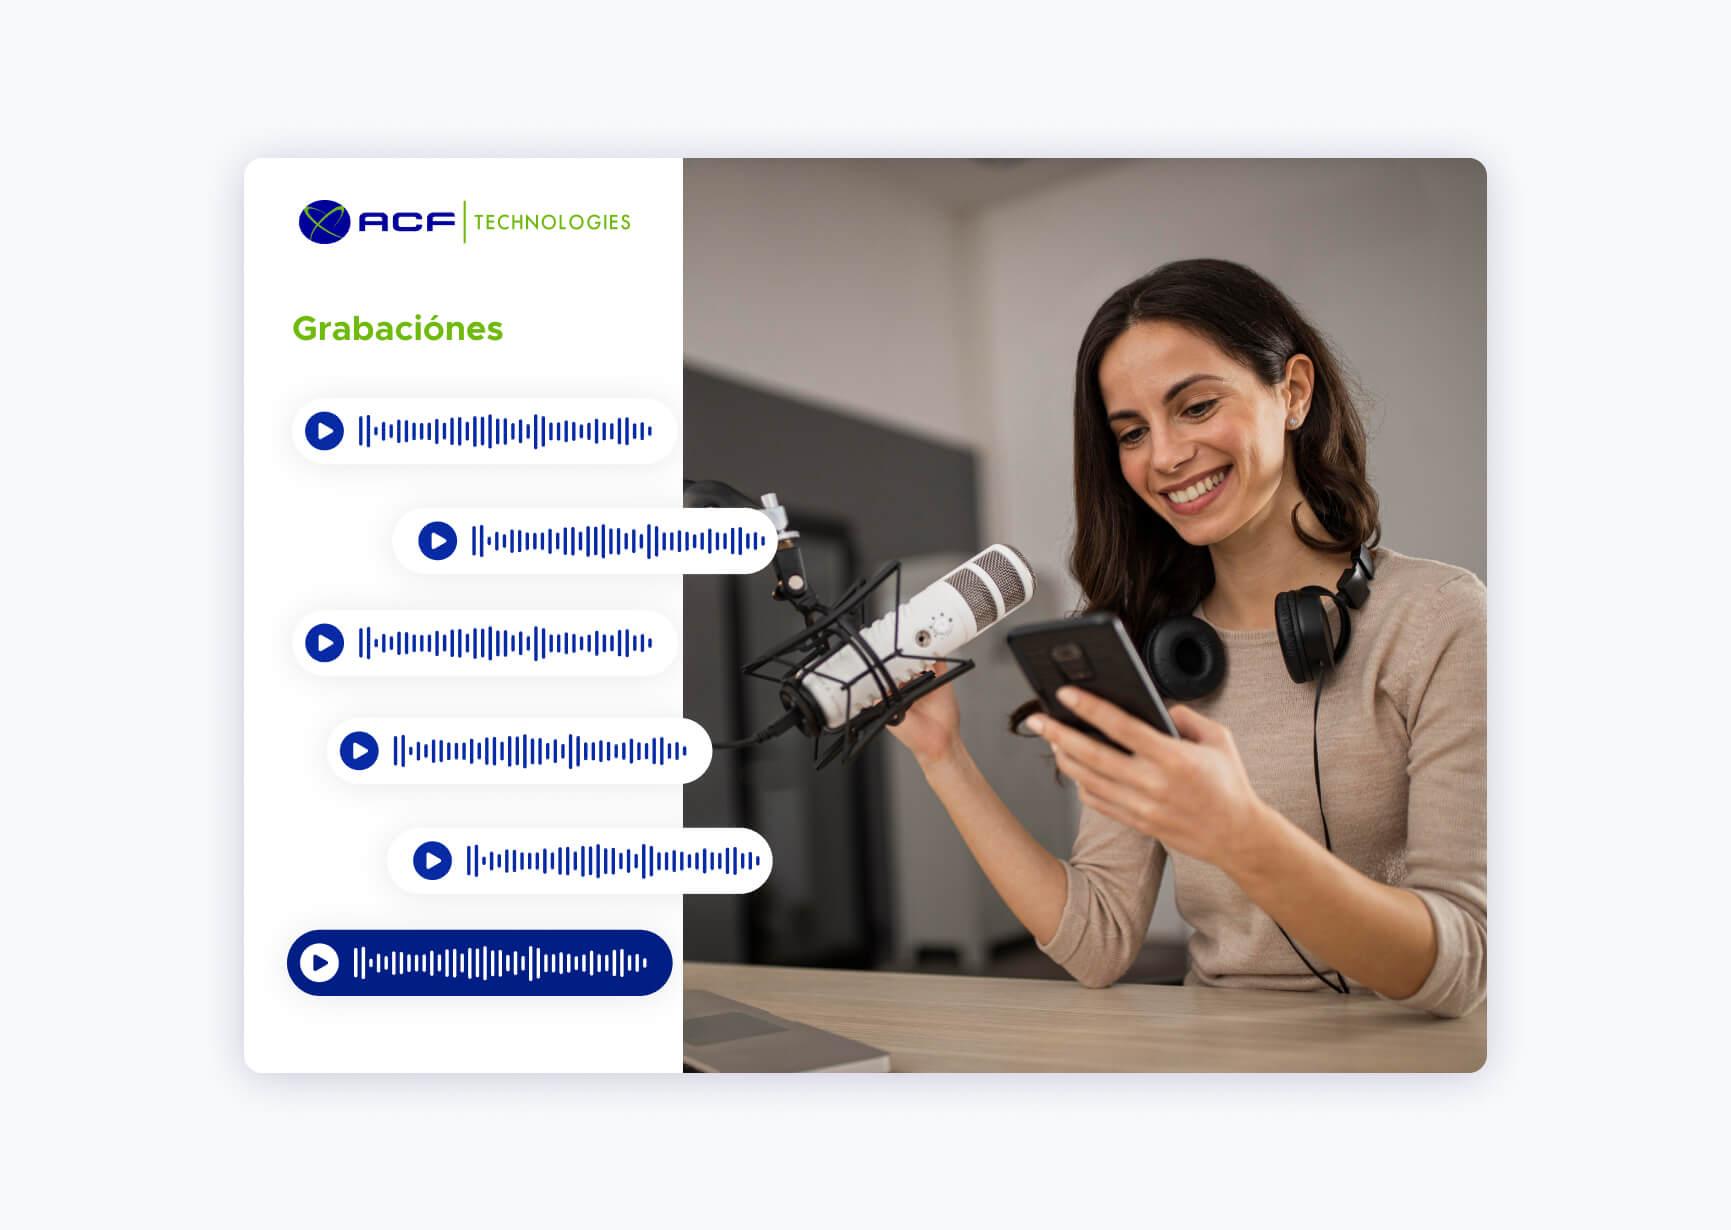 Pantalla de software de gestión de grabación de ACF Technologies